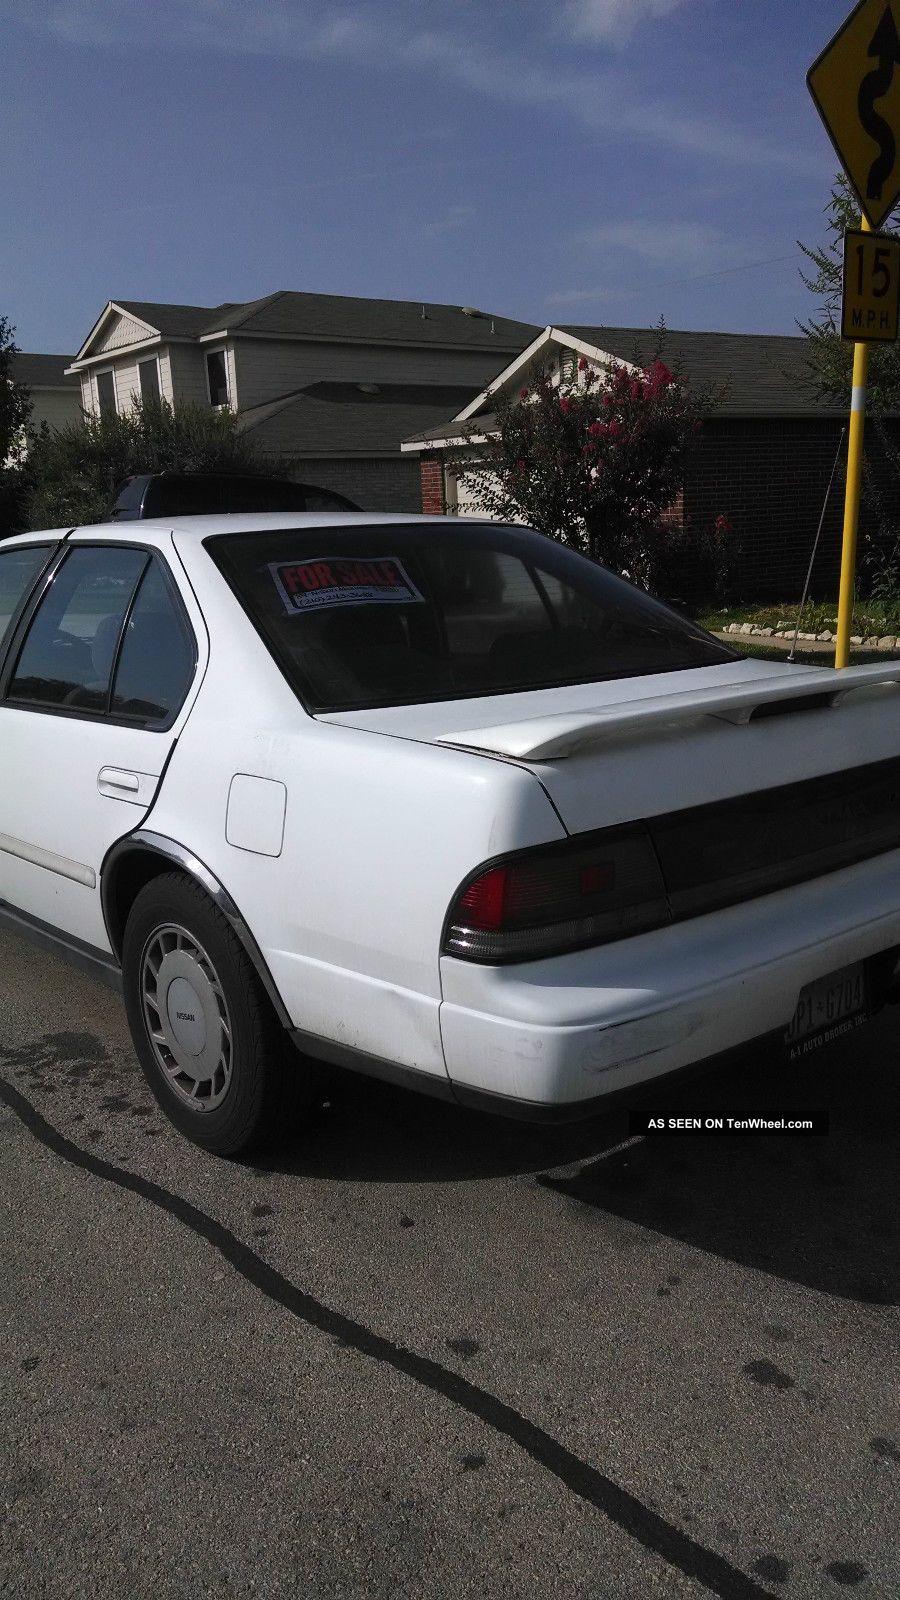 Nissan Maxima Se Sedan Door L Lgw on 1989 Toyota 3 0 V6 Engine